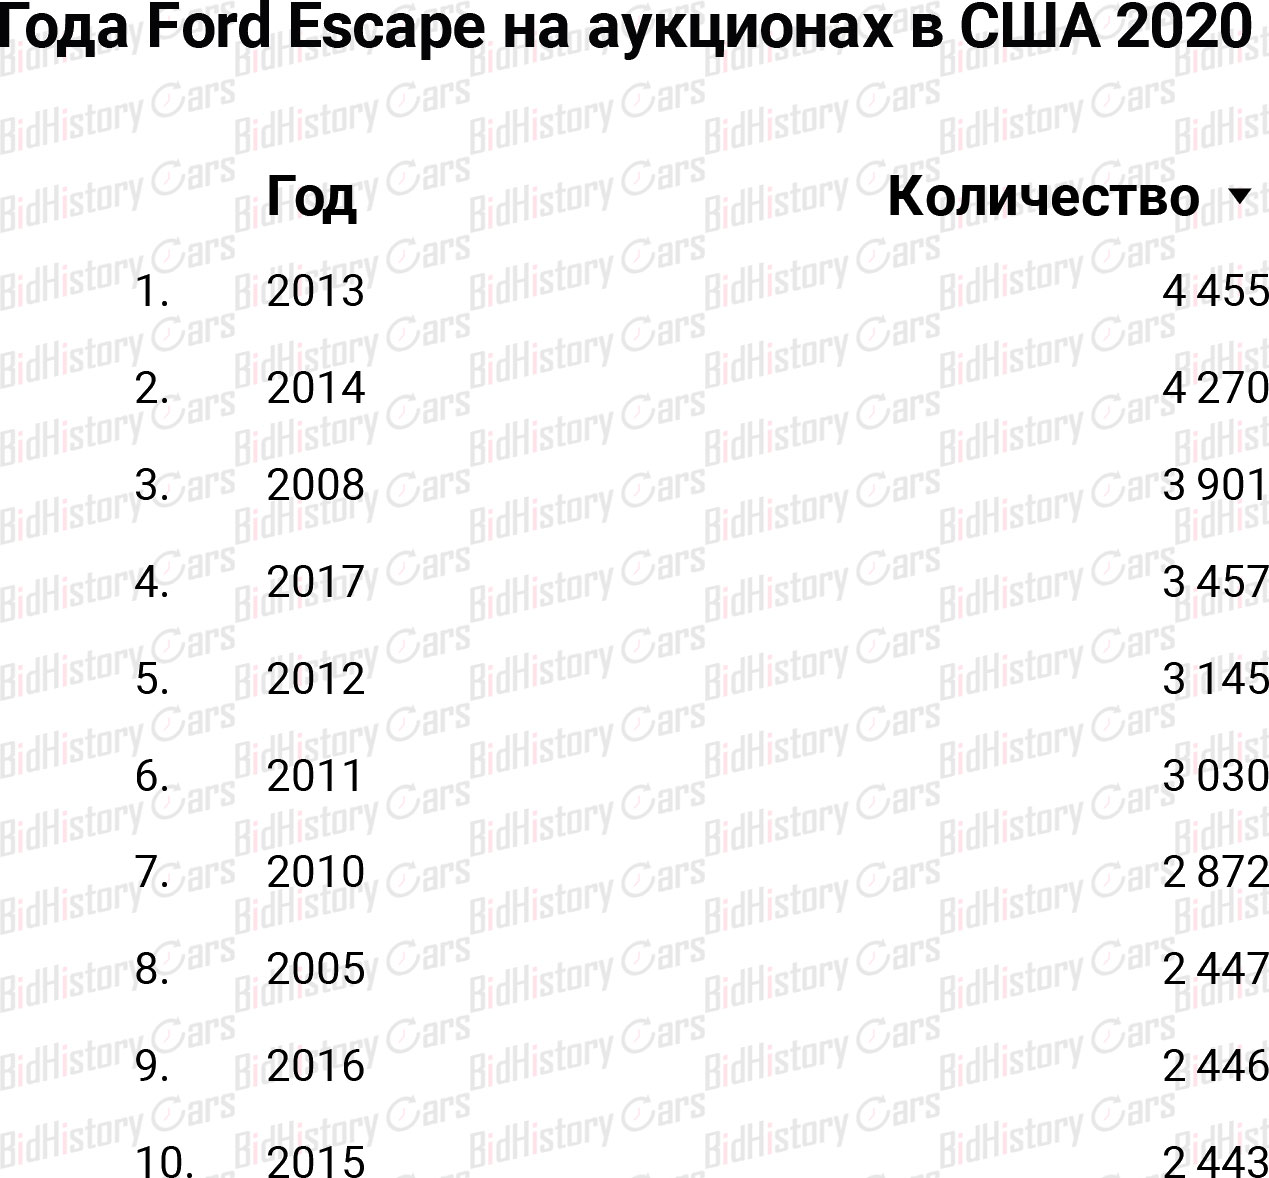 Ford Escape на аукционах с США 2020